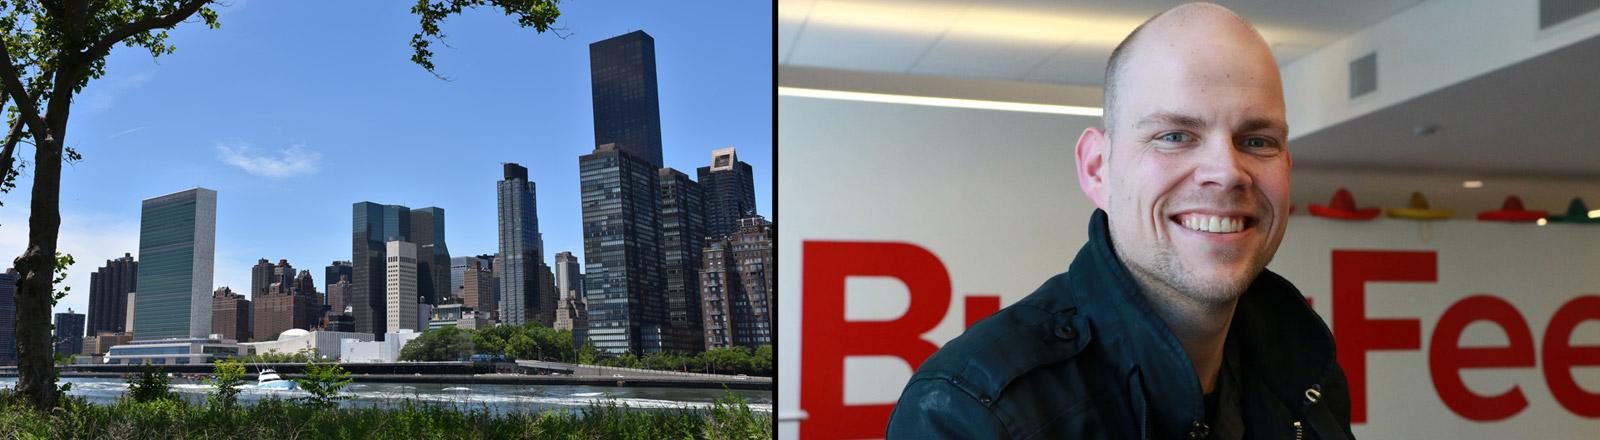 Skyline von New York | Christian Fahrenbach